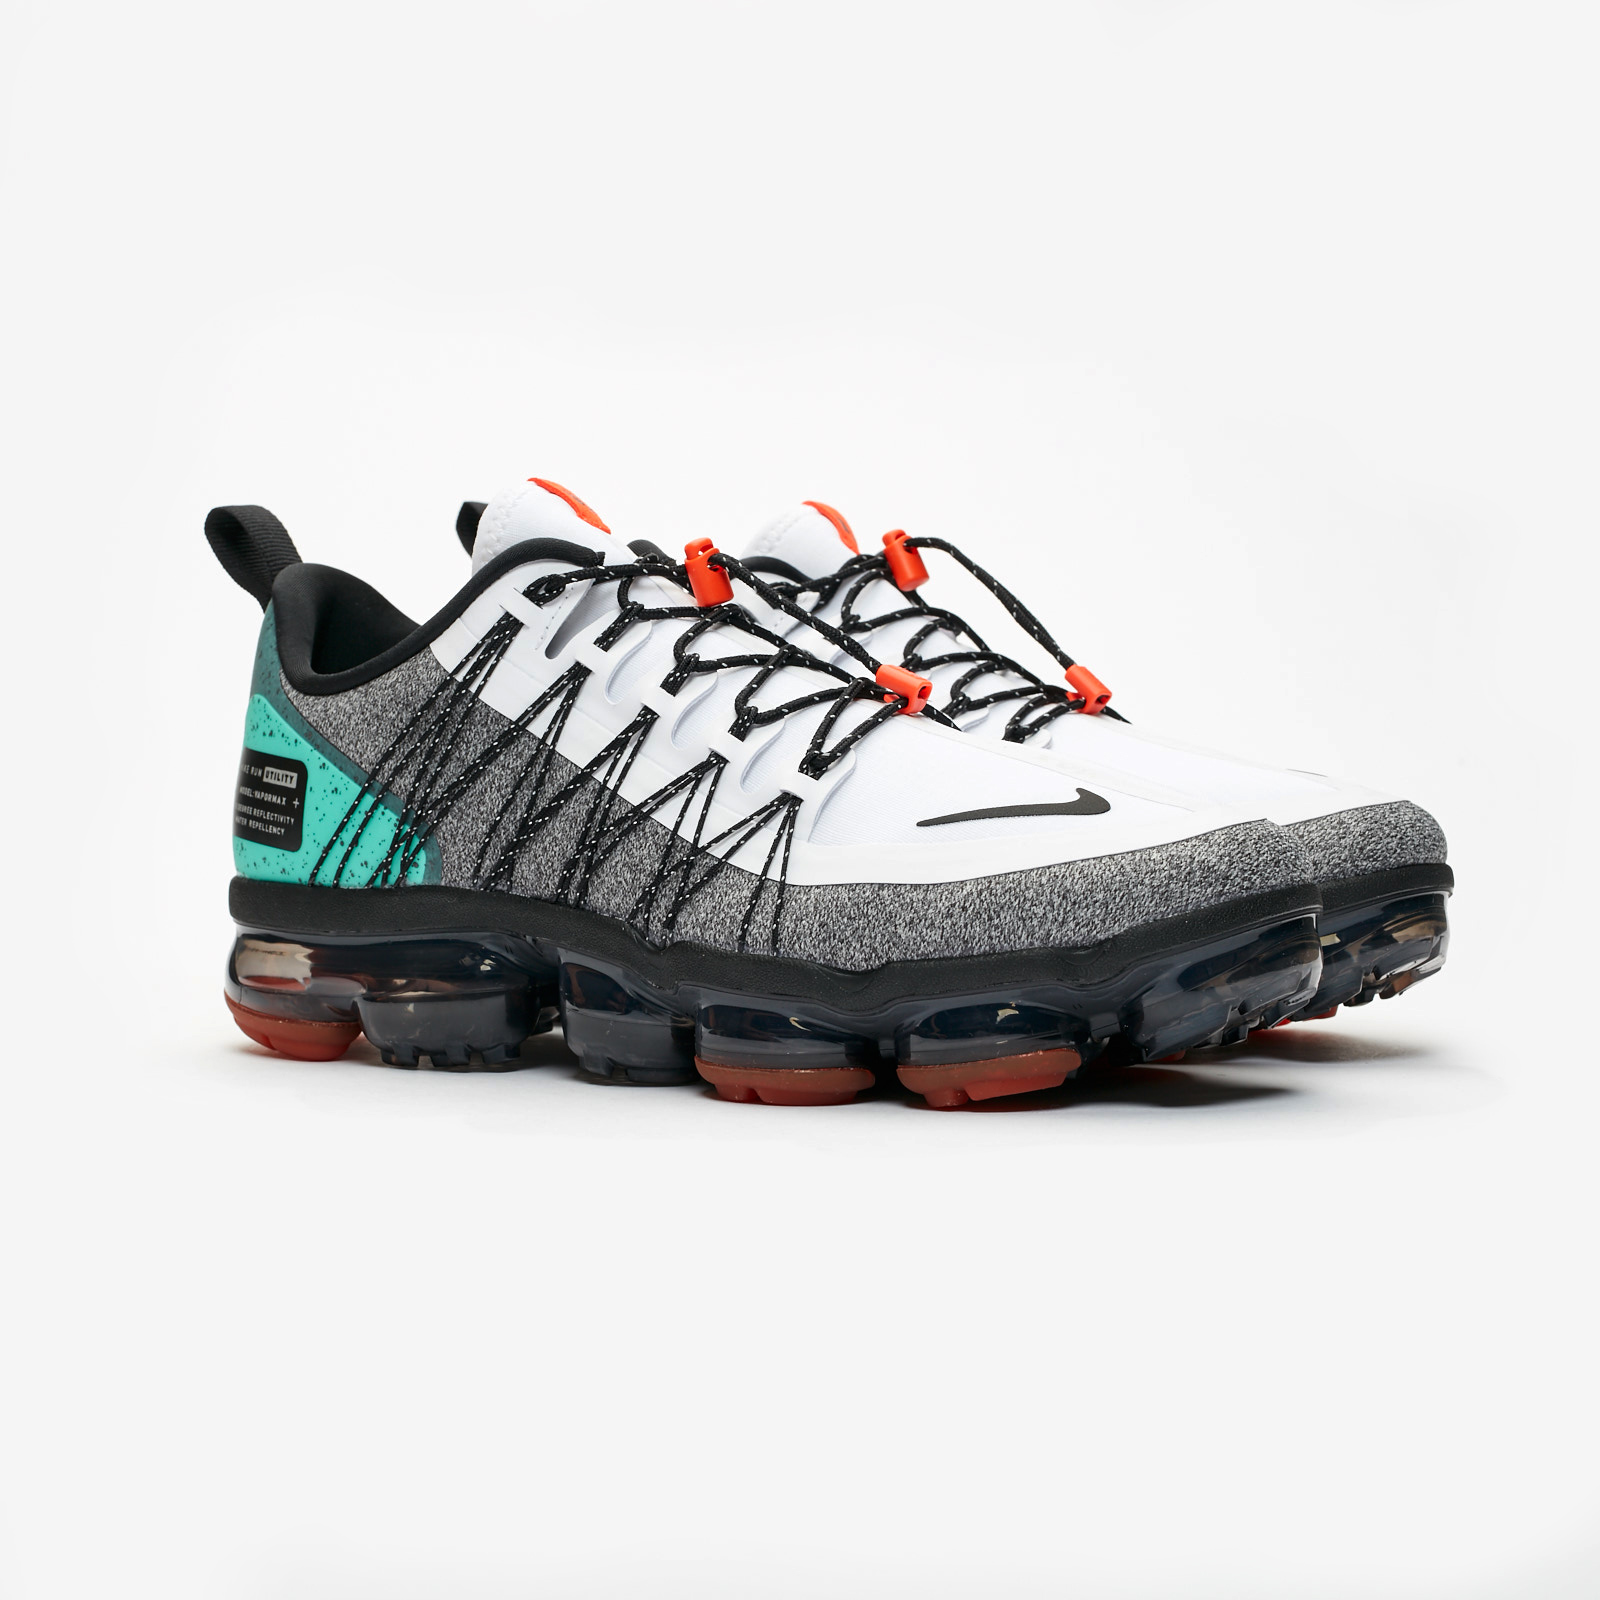 Nike Air Vapormax Run Utility NRG - Bv6874-100 - Sneakersnstuff ... 2cae3062b